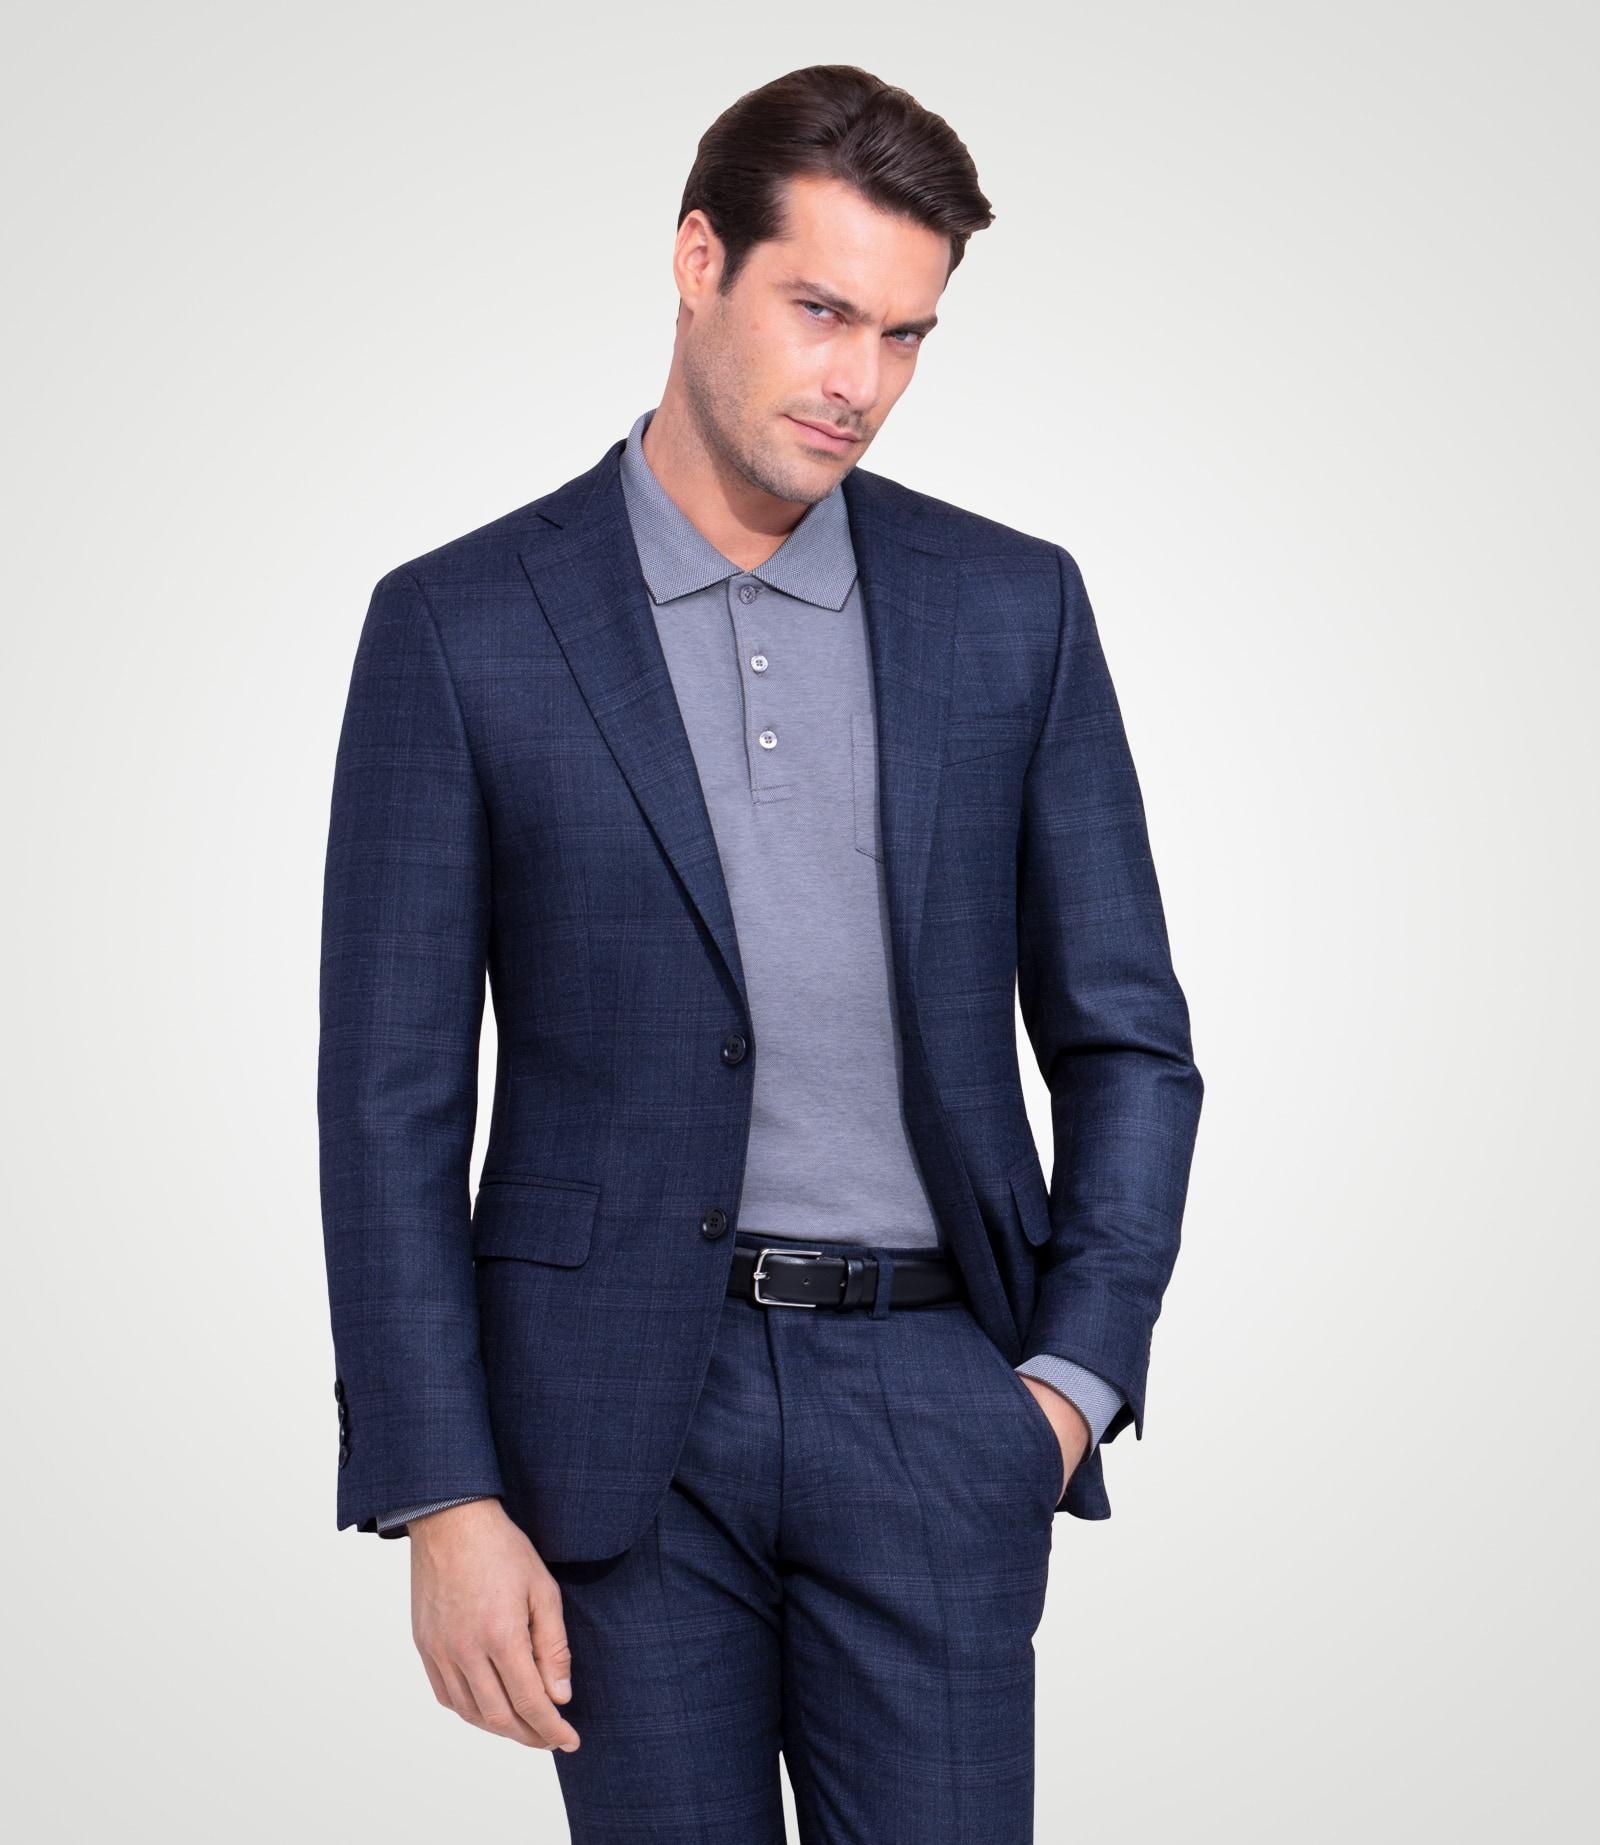 Tonal karierter Anzug